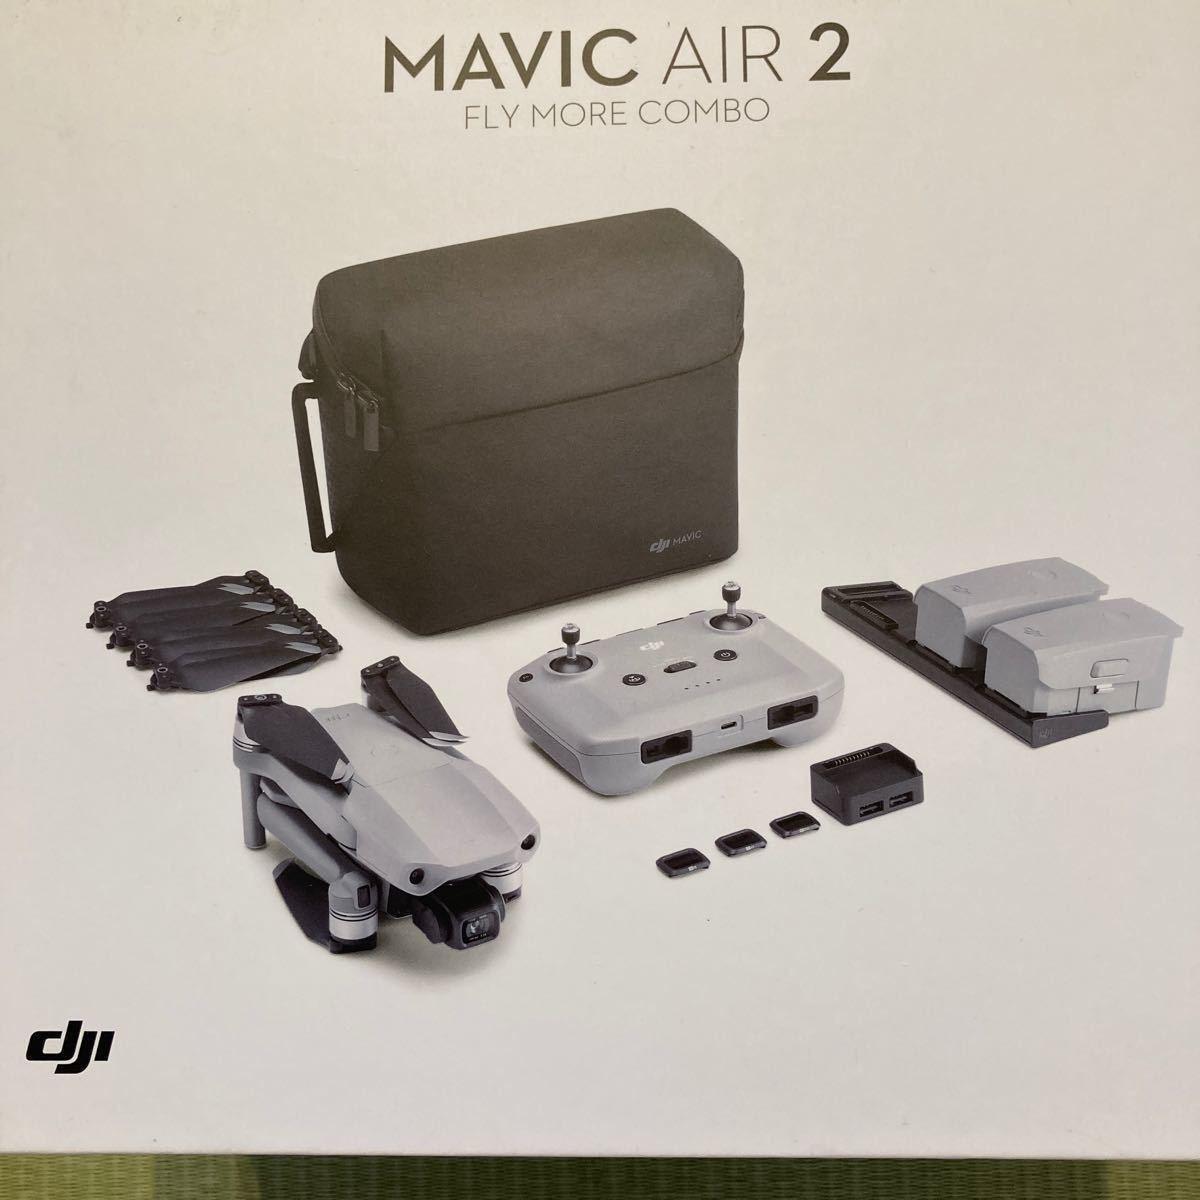 DJI MAVIC AIR 2 FLY MORE COMBO SDカード付お買い得 早い物勝ち、値下げしました。ランディグギア付き